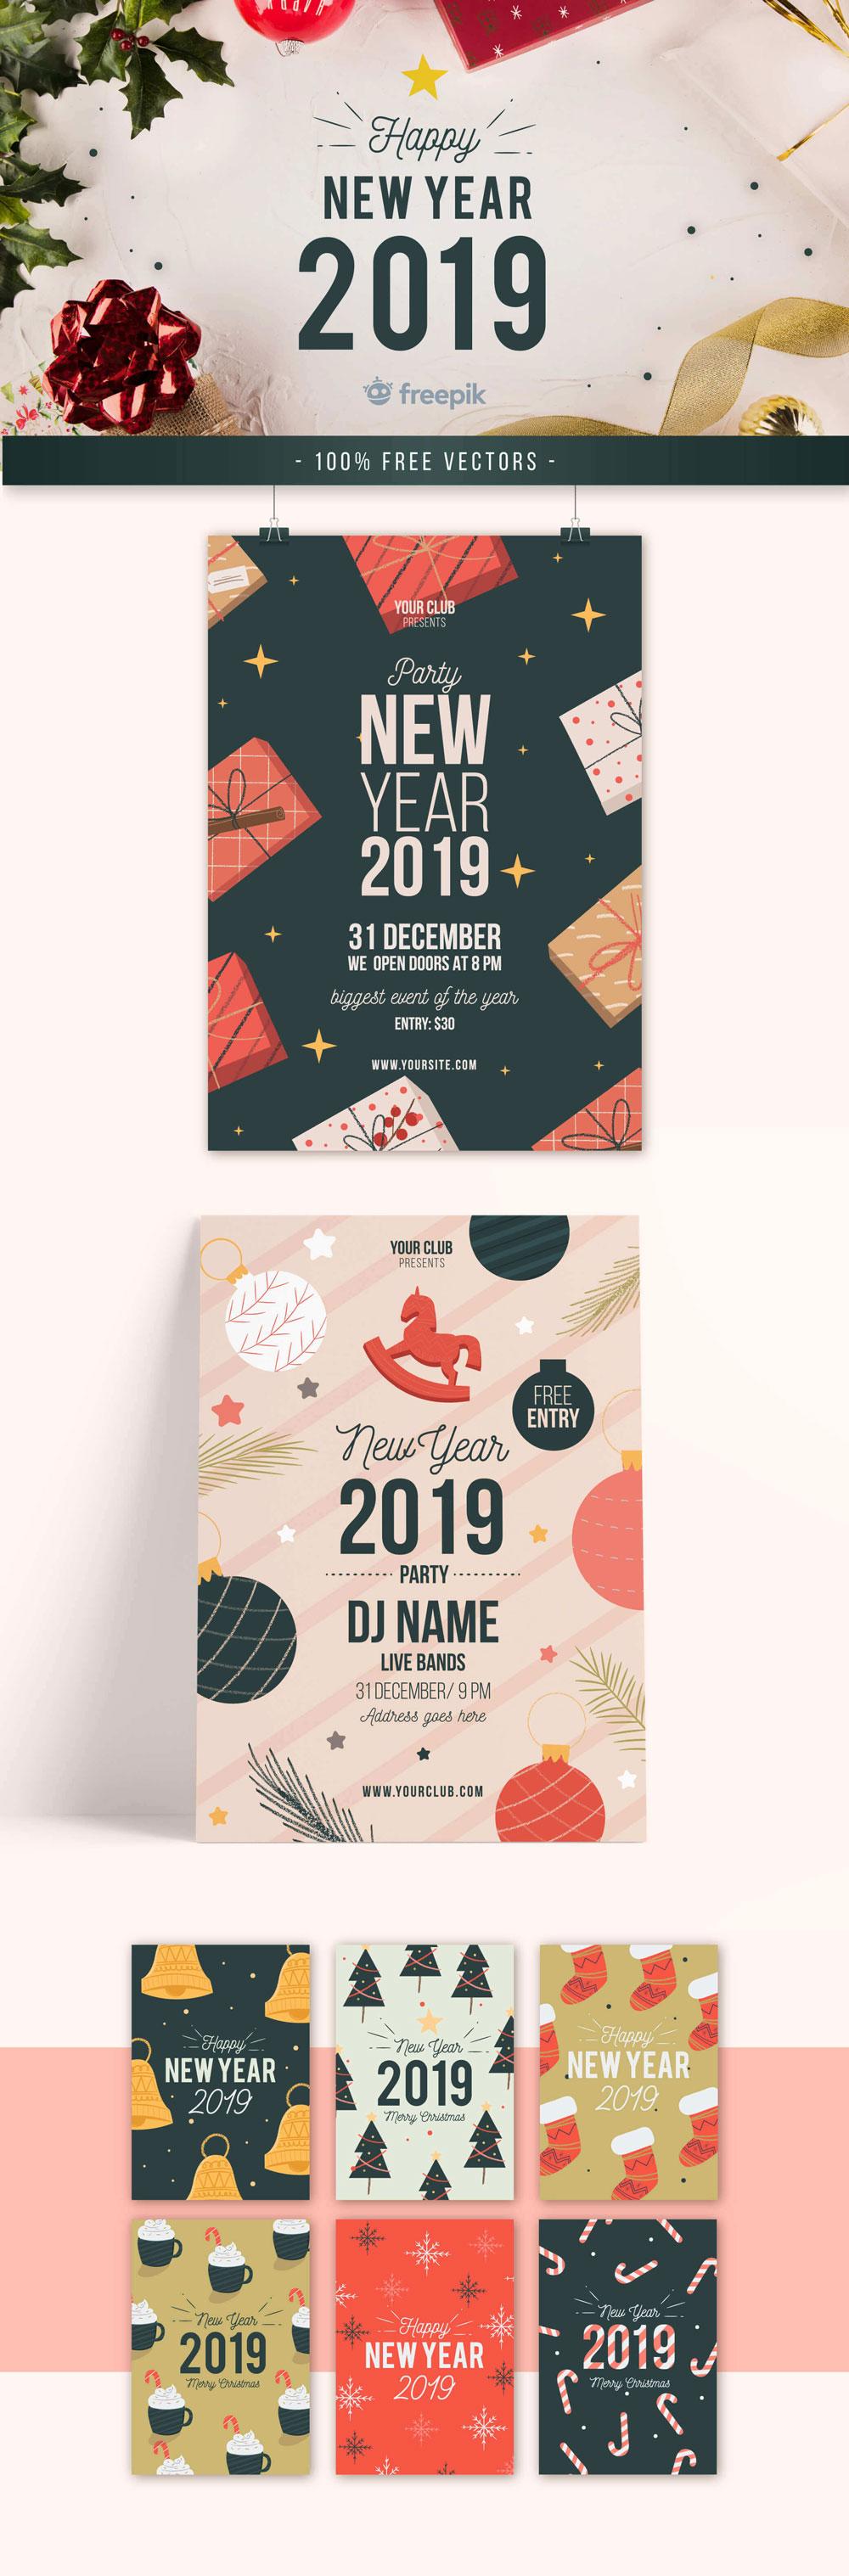 New_Year-1